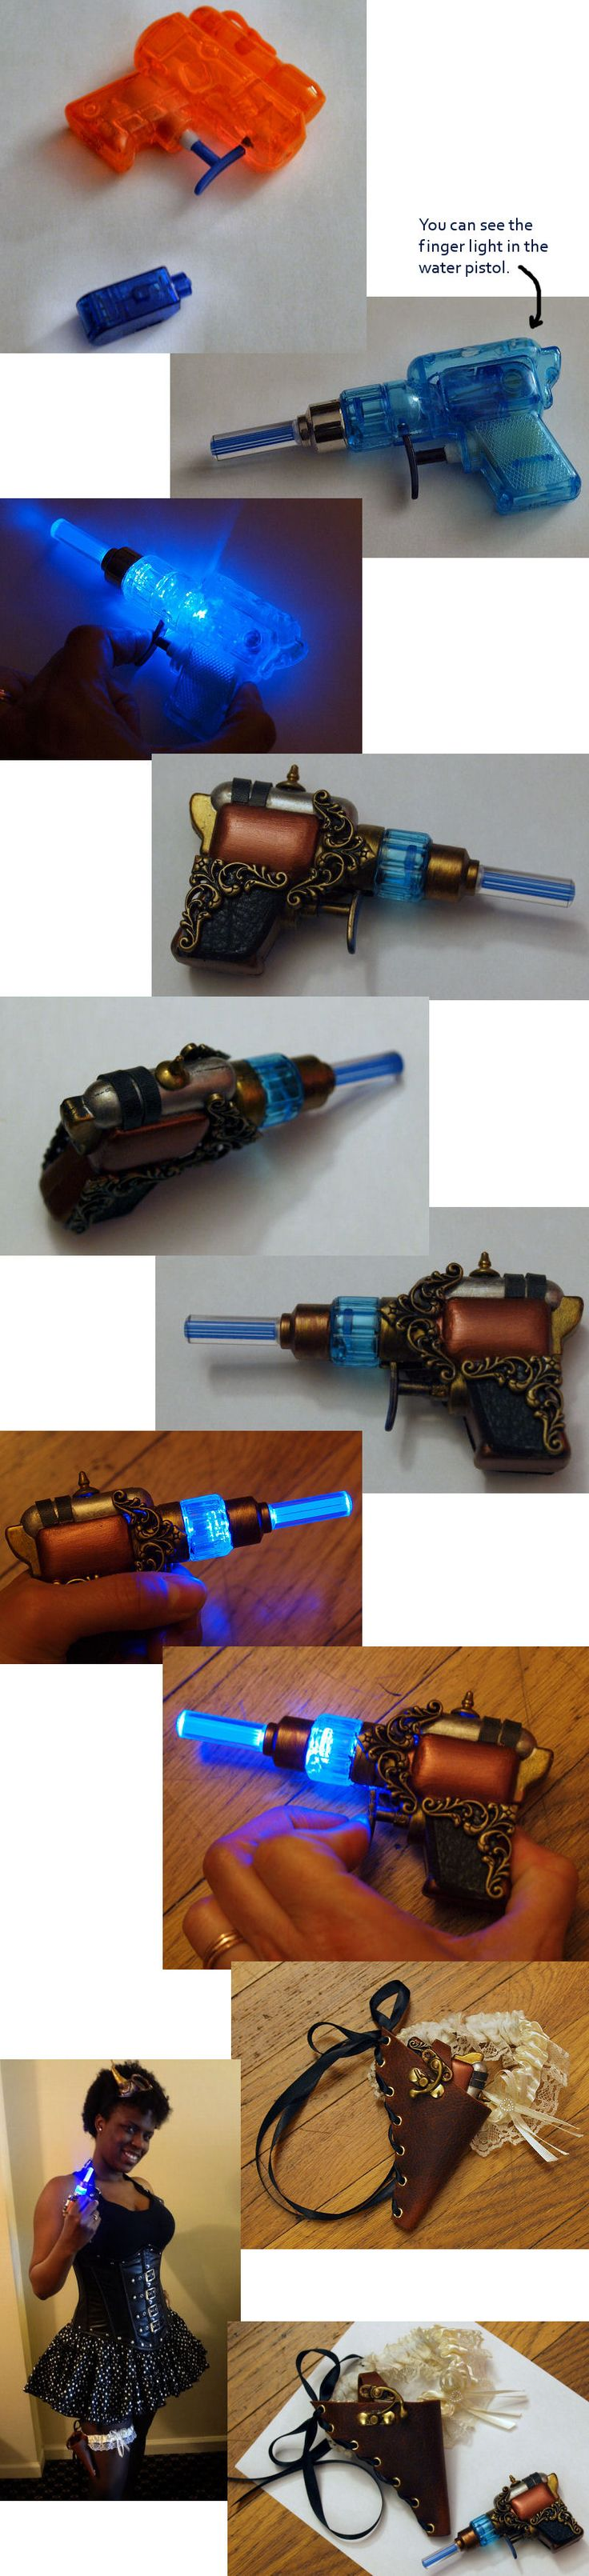 Steampunk Lady Killer Pistol and Garter Holster by ajldesign.deviantart.com on @DeviantArt